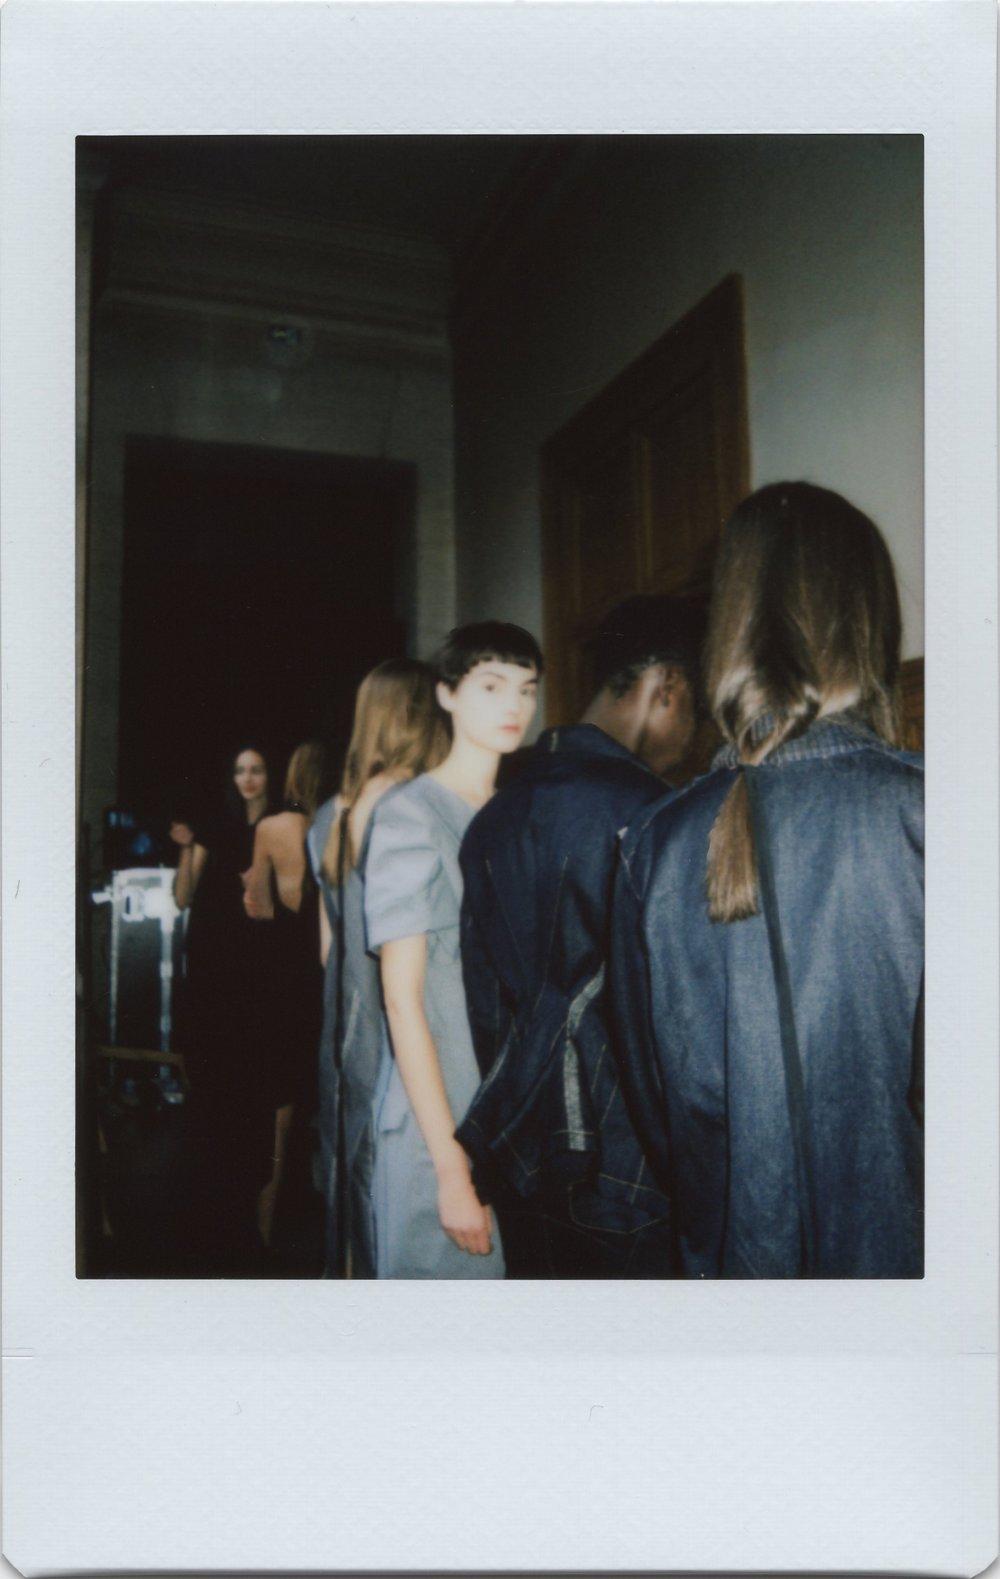 MoonYoungHee_Honigschreck_Backstage_Polaroid_4.jpg